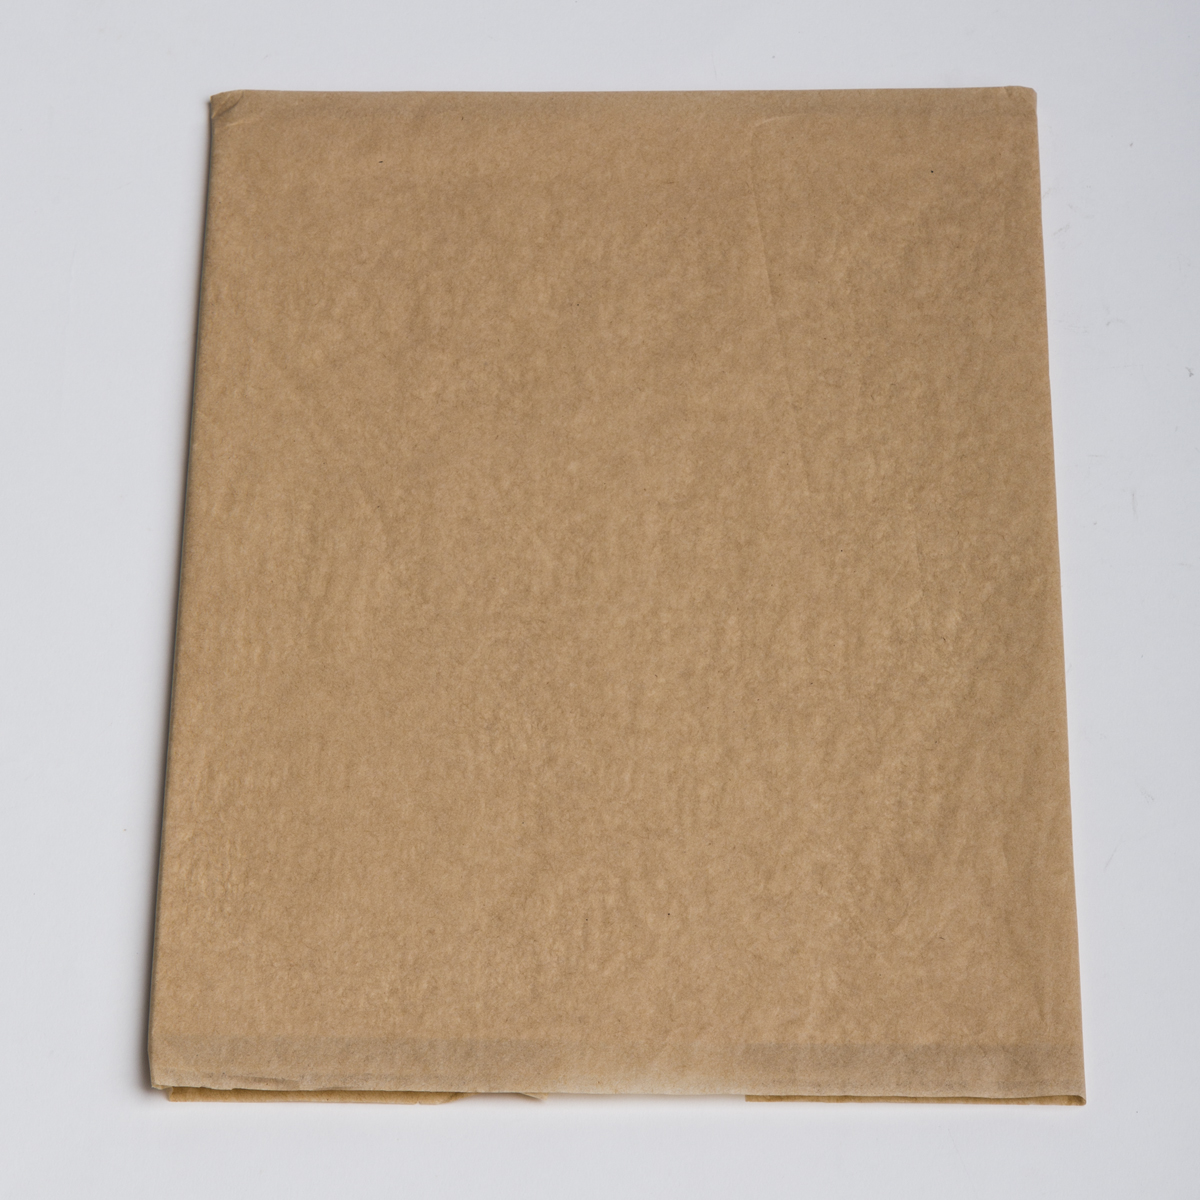 KRAFT TISSUE PAPER